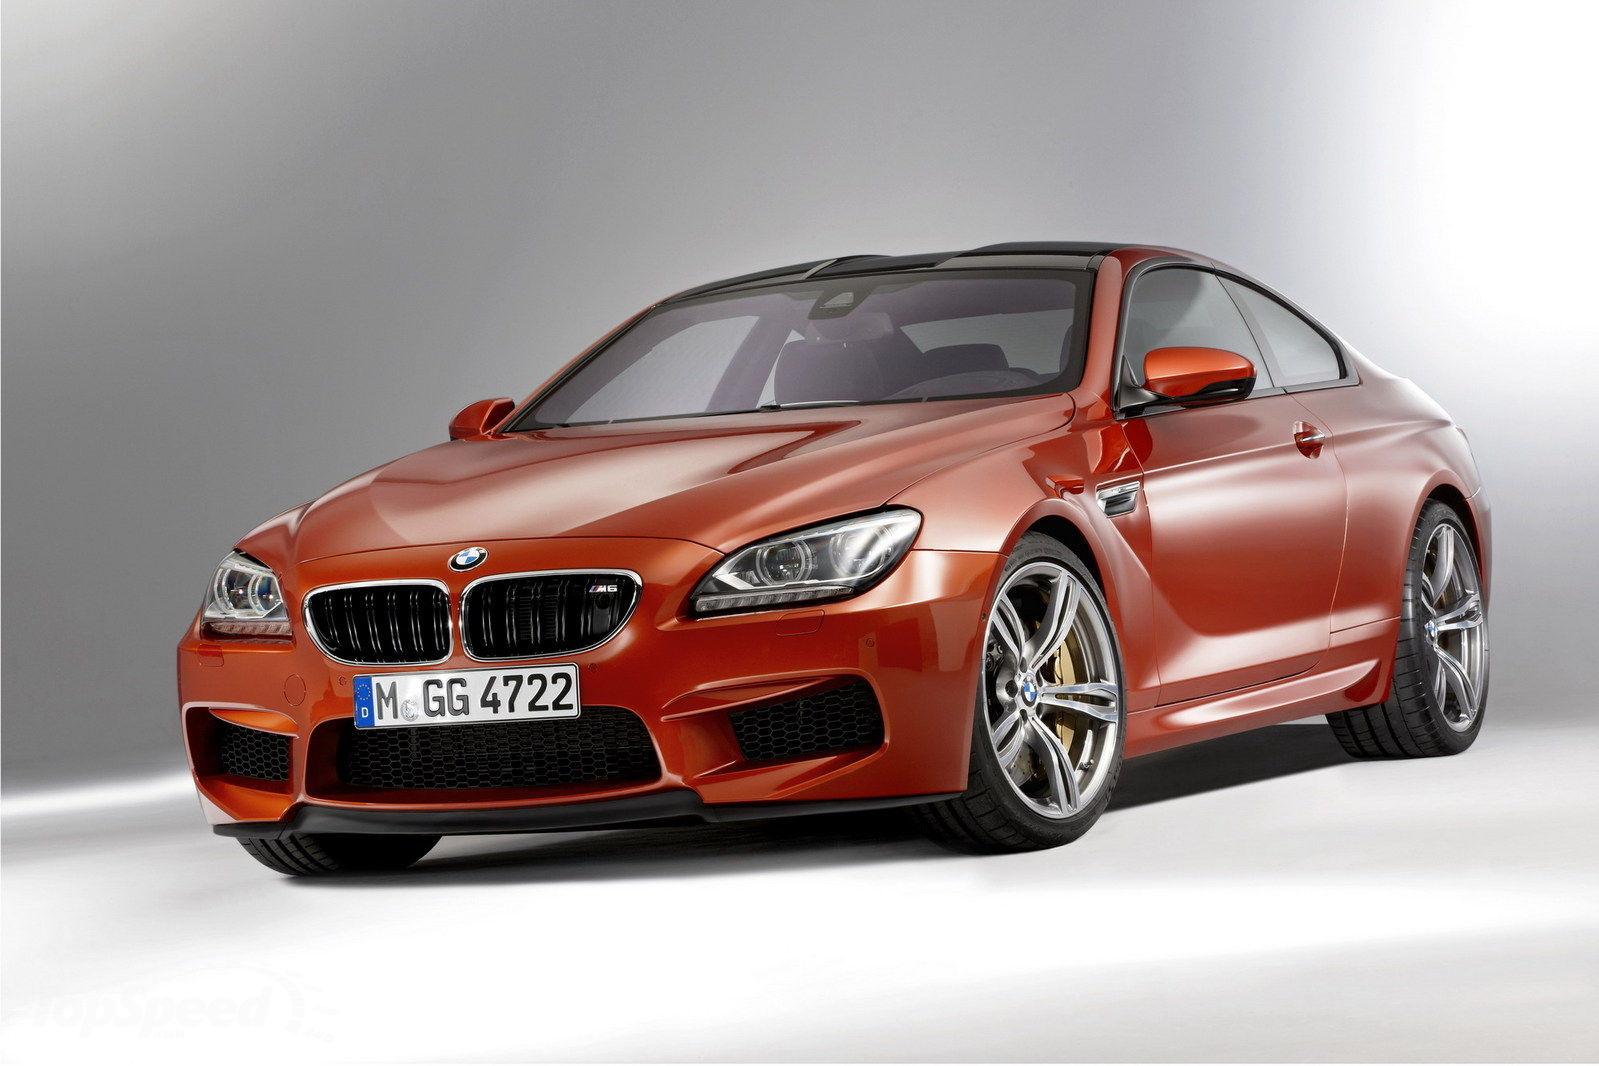 auto 2013 BMW M5 vs 2013 BMW M6 Coupe